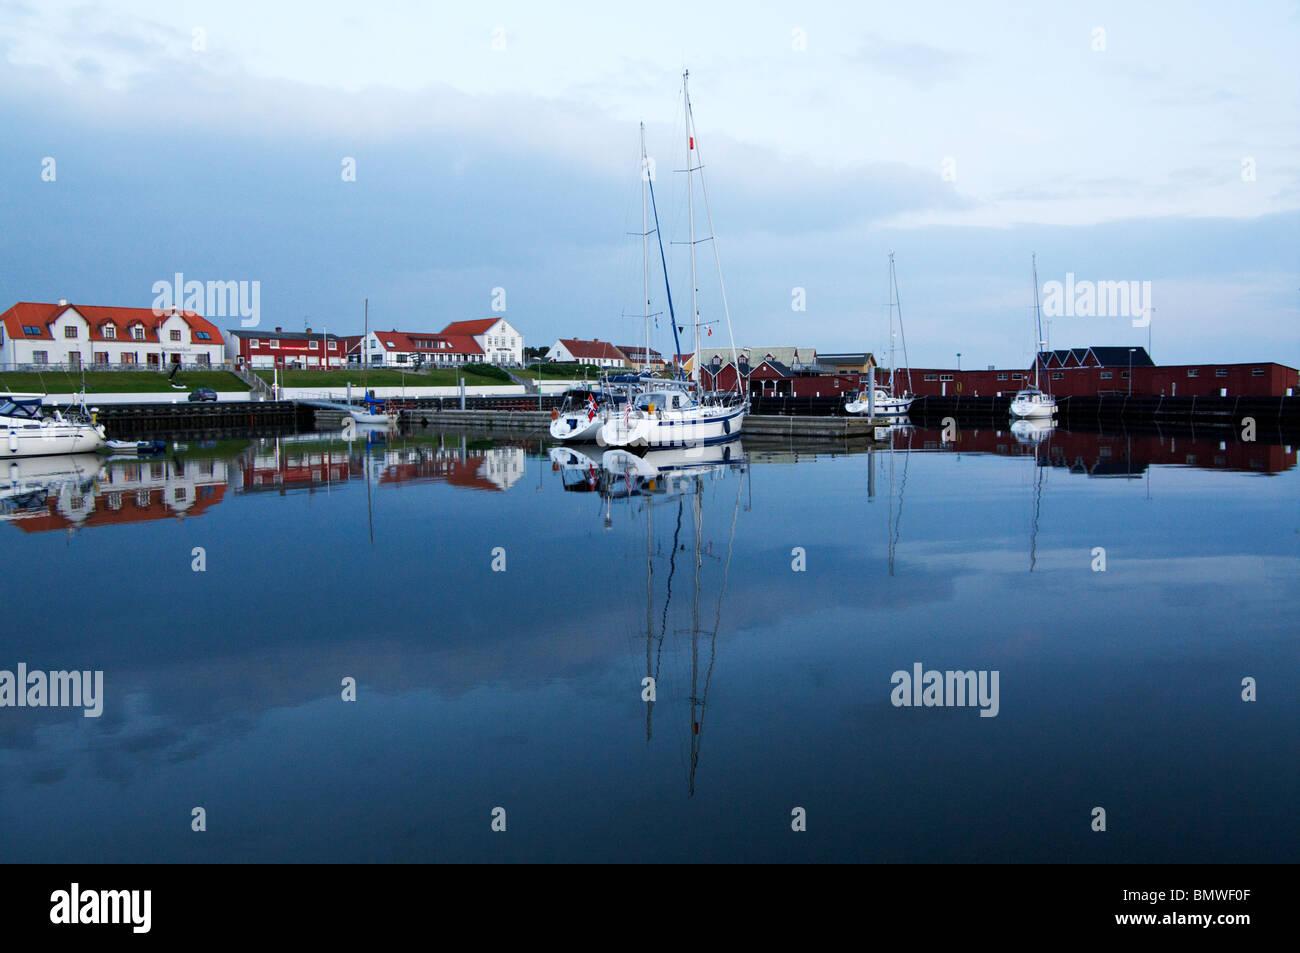 Sailboat at Vesterø Havn, Læsø - Stock Image